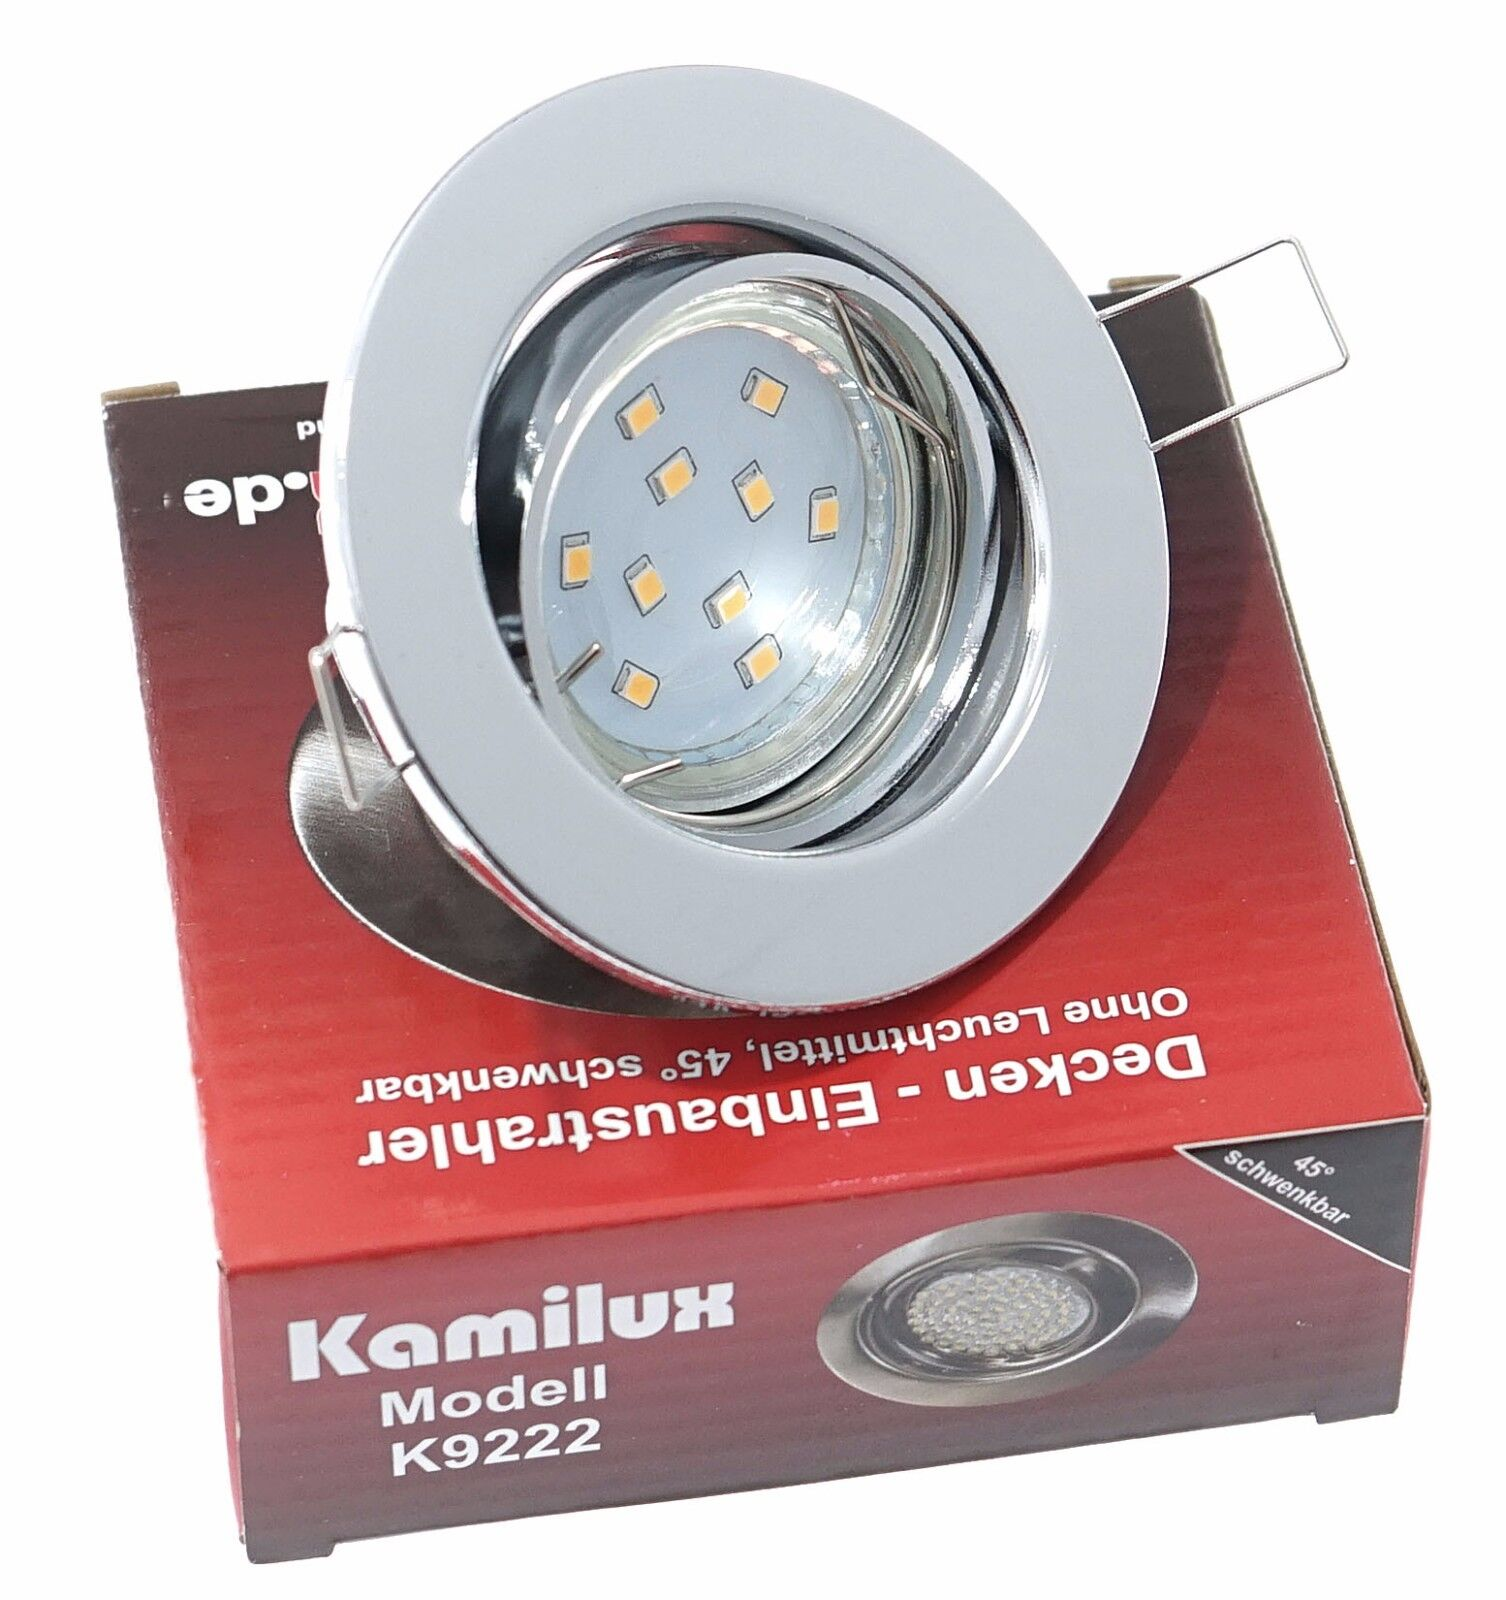 LED Einbau Deckenstrahler Spots 230V GU10 SMD 5W=50W TOM rund schwenkbar